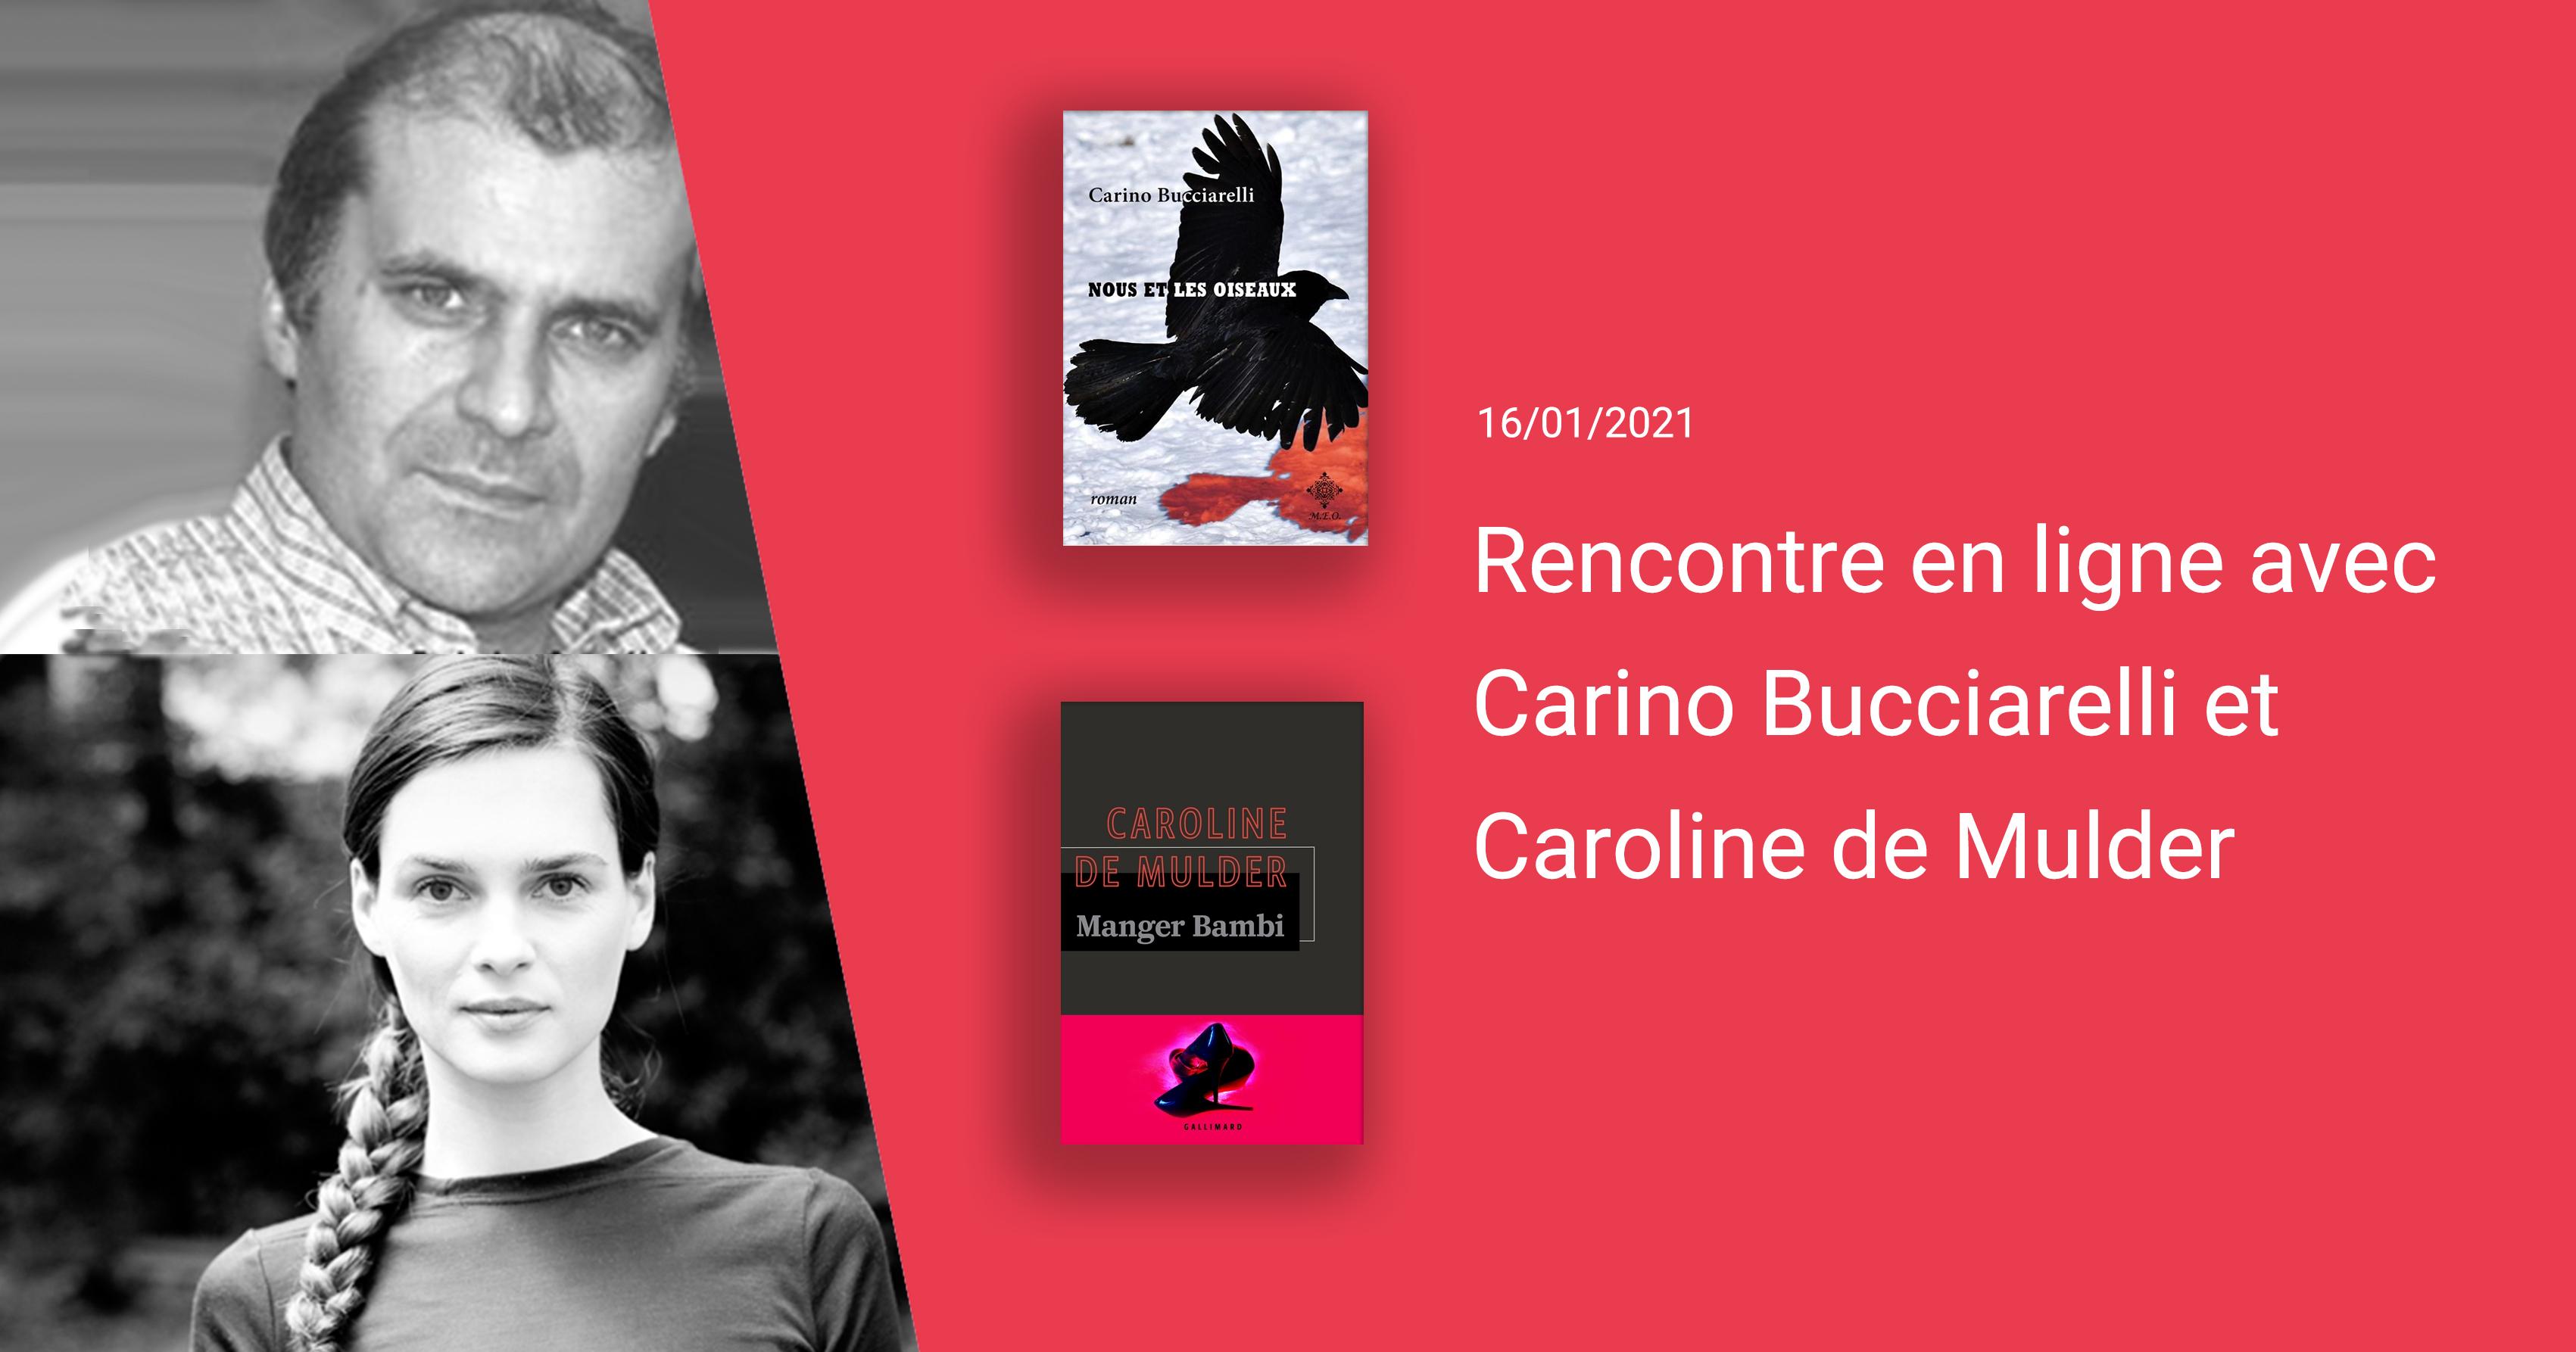 Rencontre en ligne avec Carino Bucciarelli et Caroline de Mulder